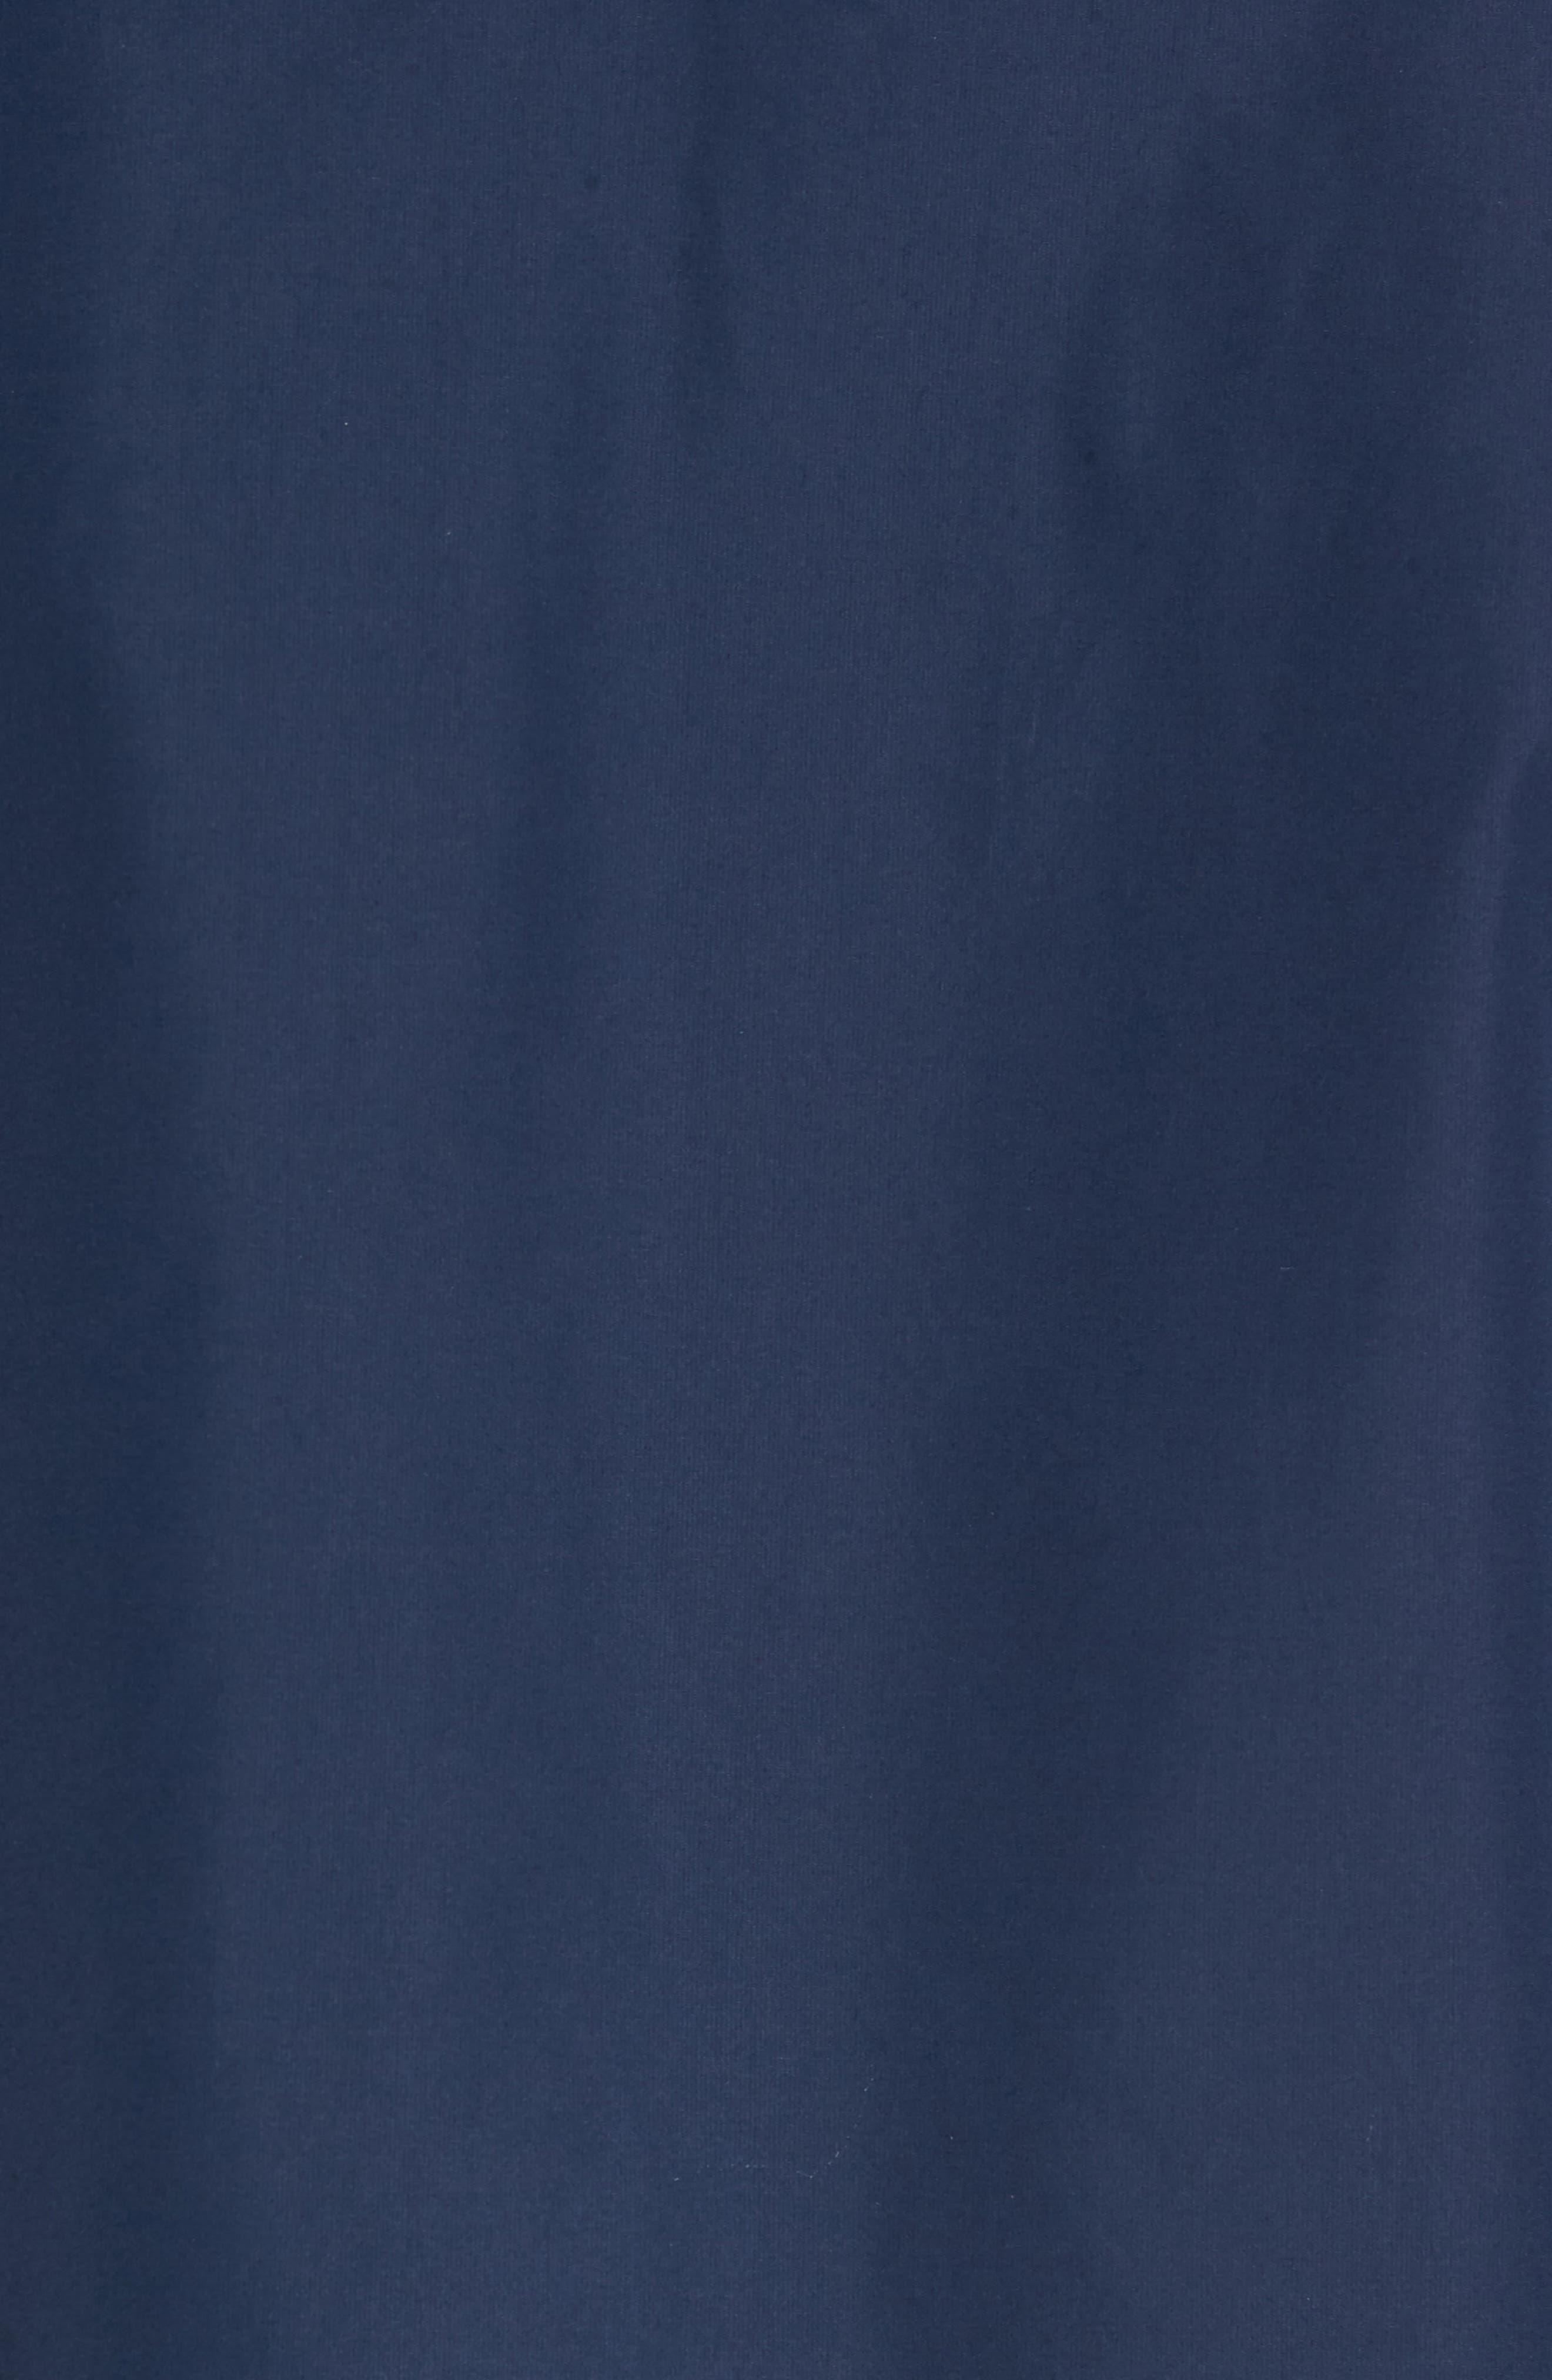 Tech Windbreaker Vest,                             Alternate thumbnail 6, color,                             410